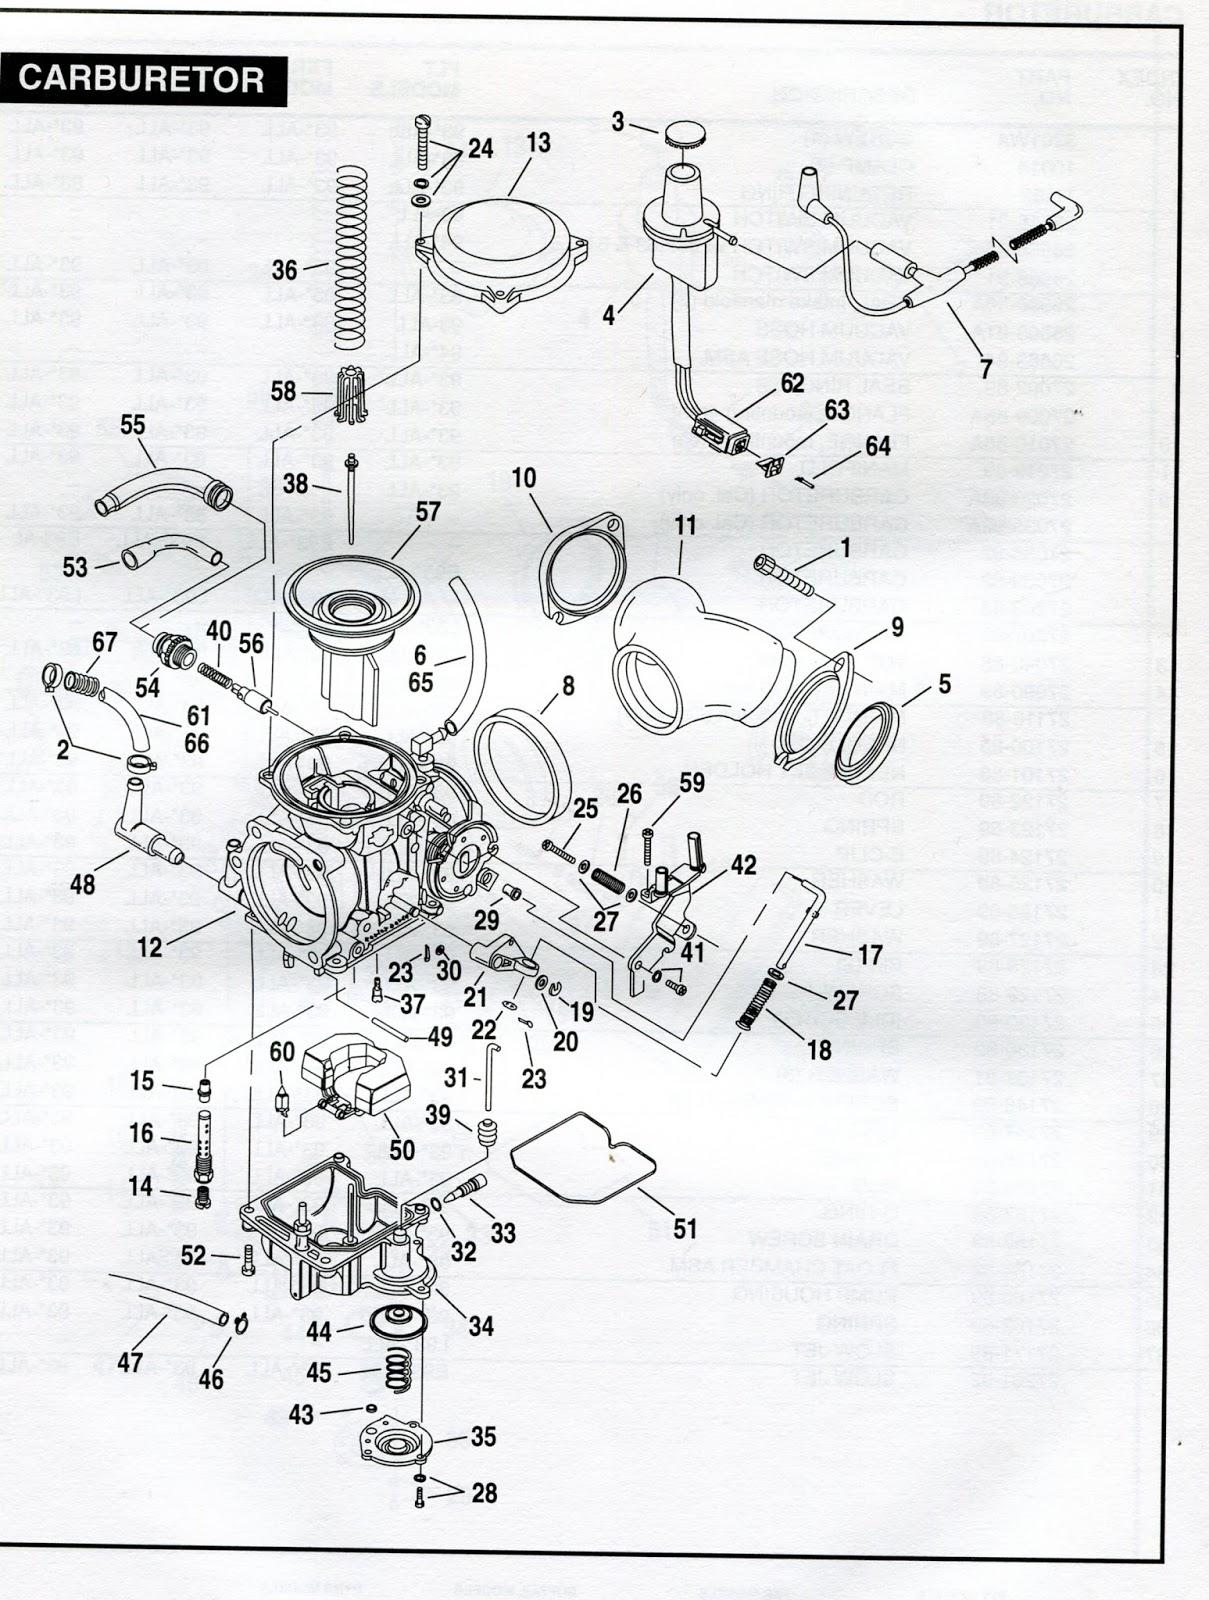 medium resolution of tech files 1993 94 harley davidson carb diagrams fuel tank logos carburetor parts diagram 94 harley carburetor diagram